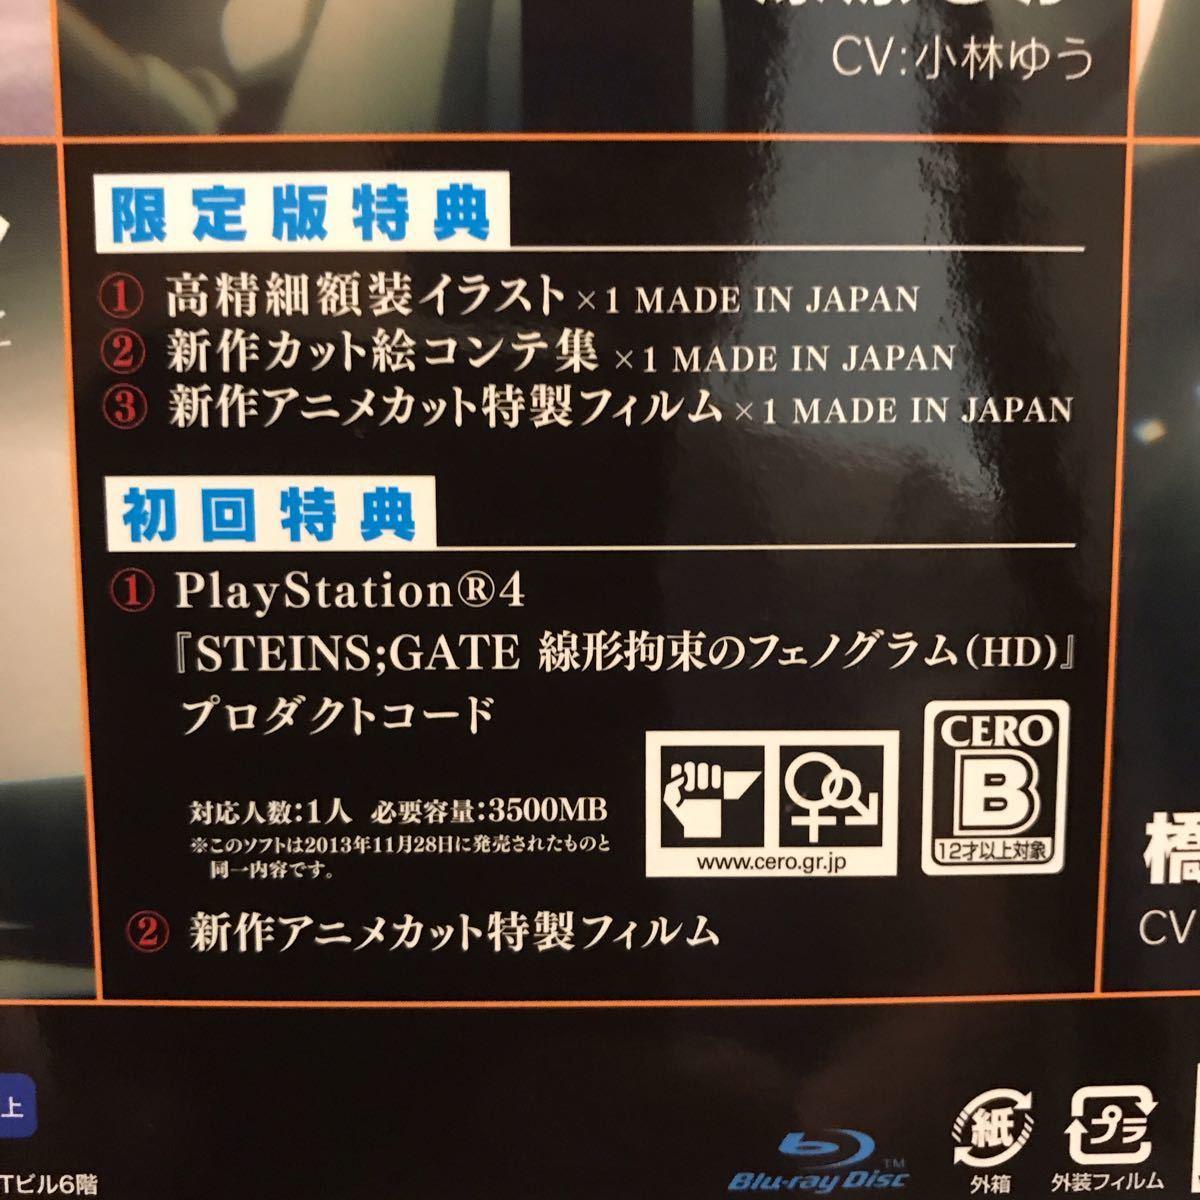 PS4 STEINS;GATE ELITE 完全受注生産限定版